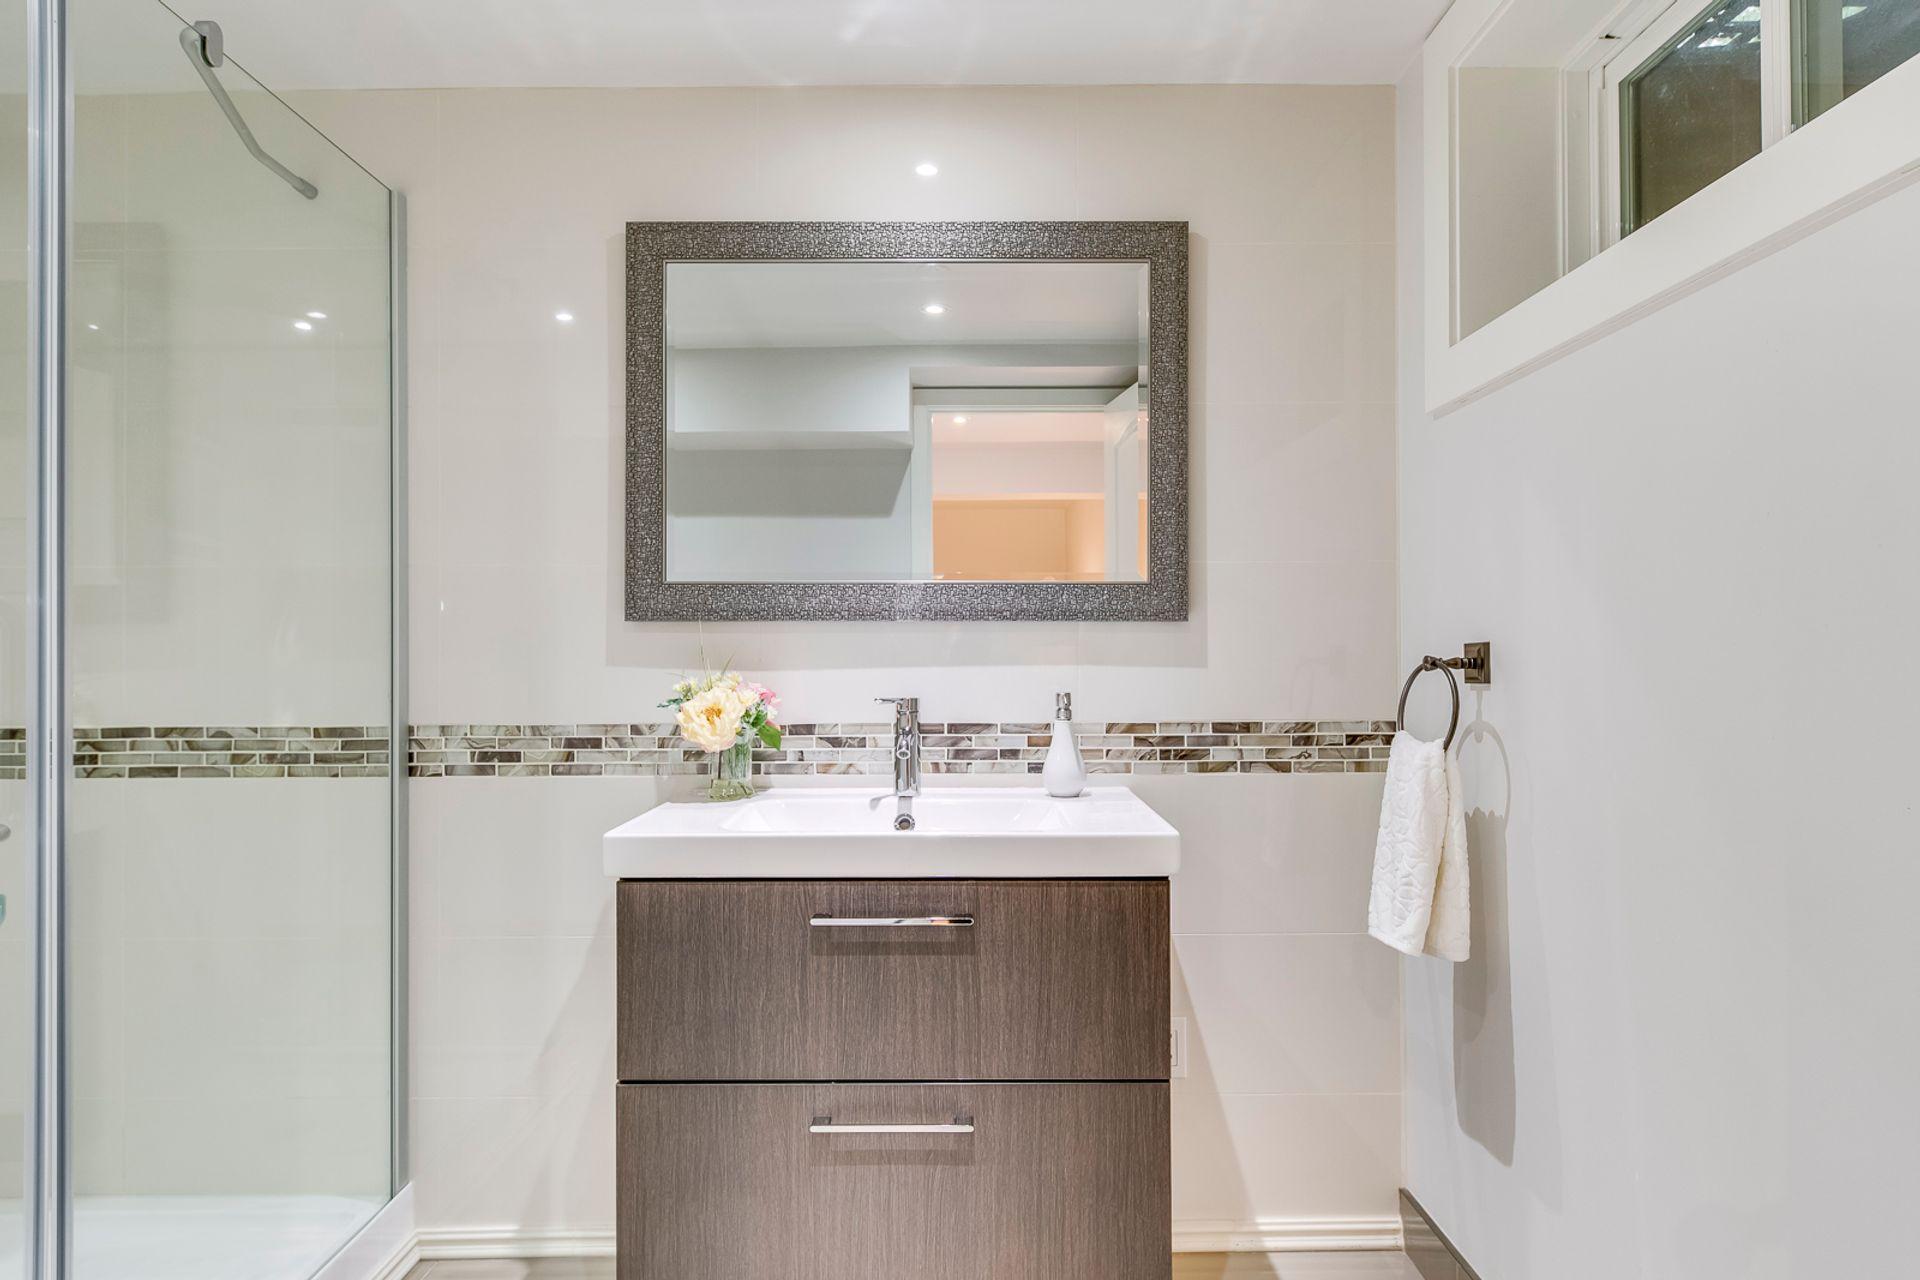 Basement Bathroom - 2129 Constance Dr, Oakville - Elite3 & Team at 2129 Constance Drive, Eastlake, Oakville